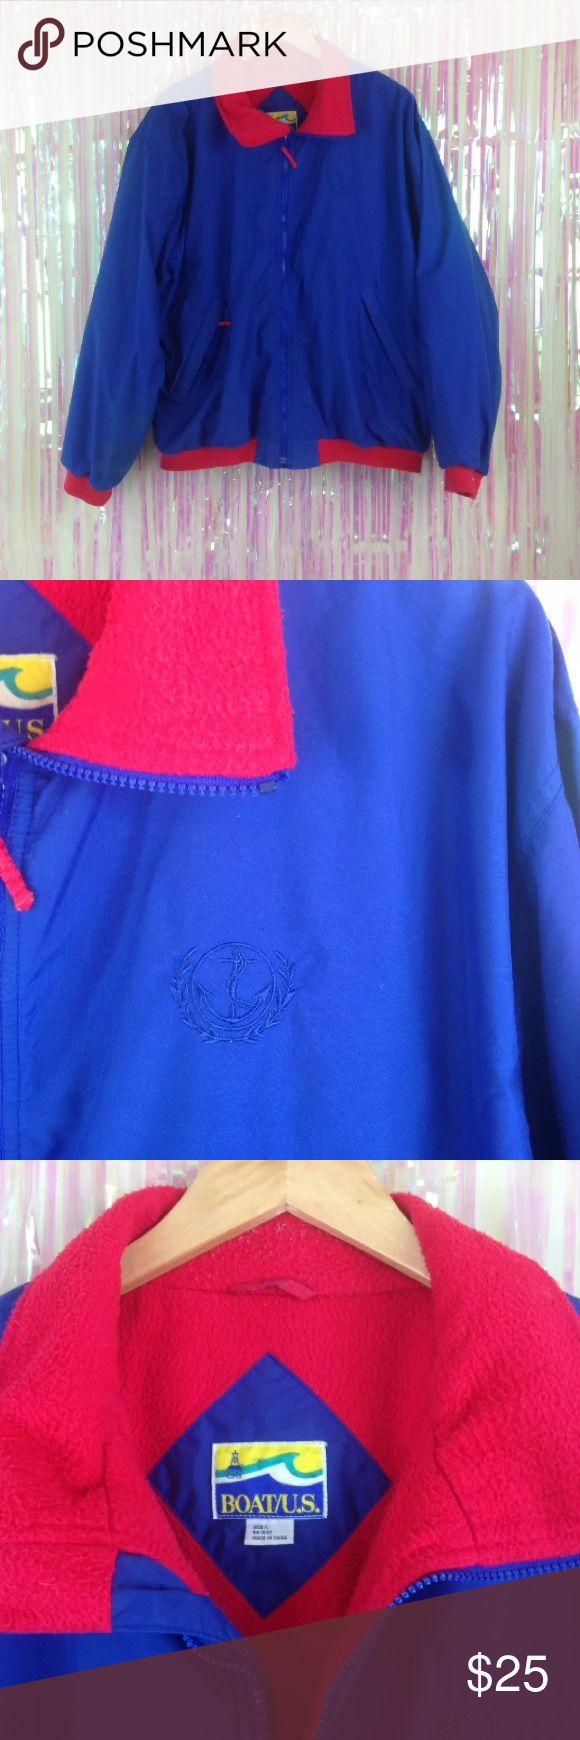 Vtg 80s 90s color block nautical coat jacket